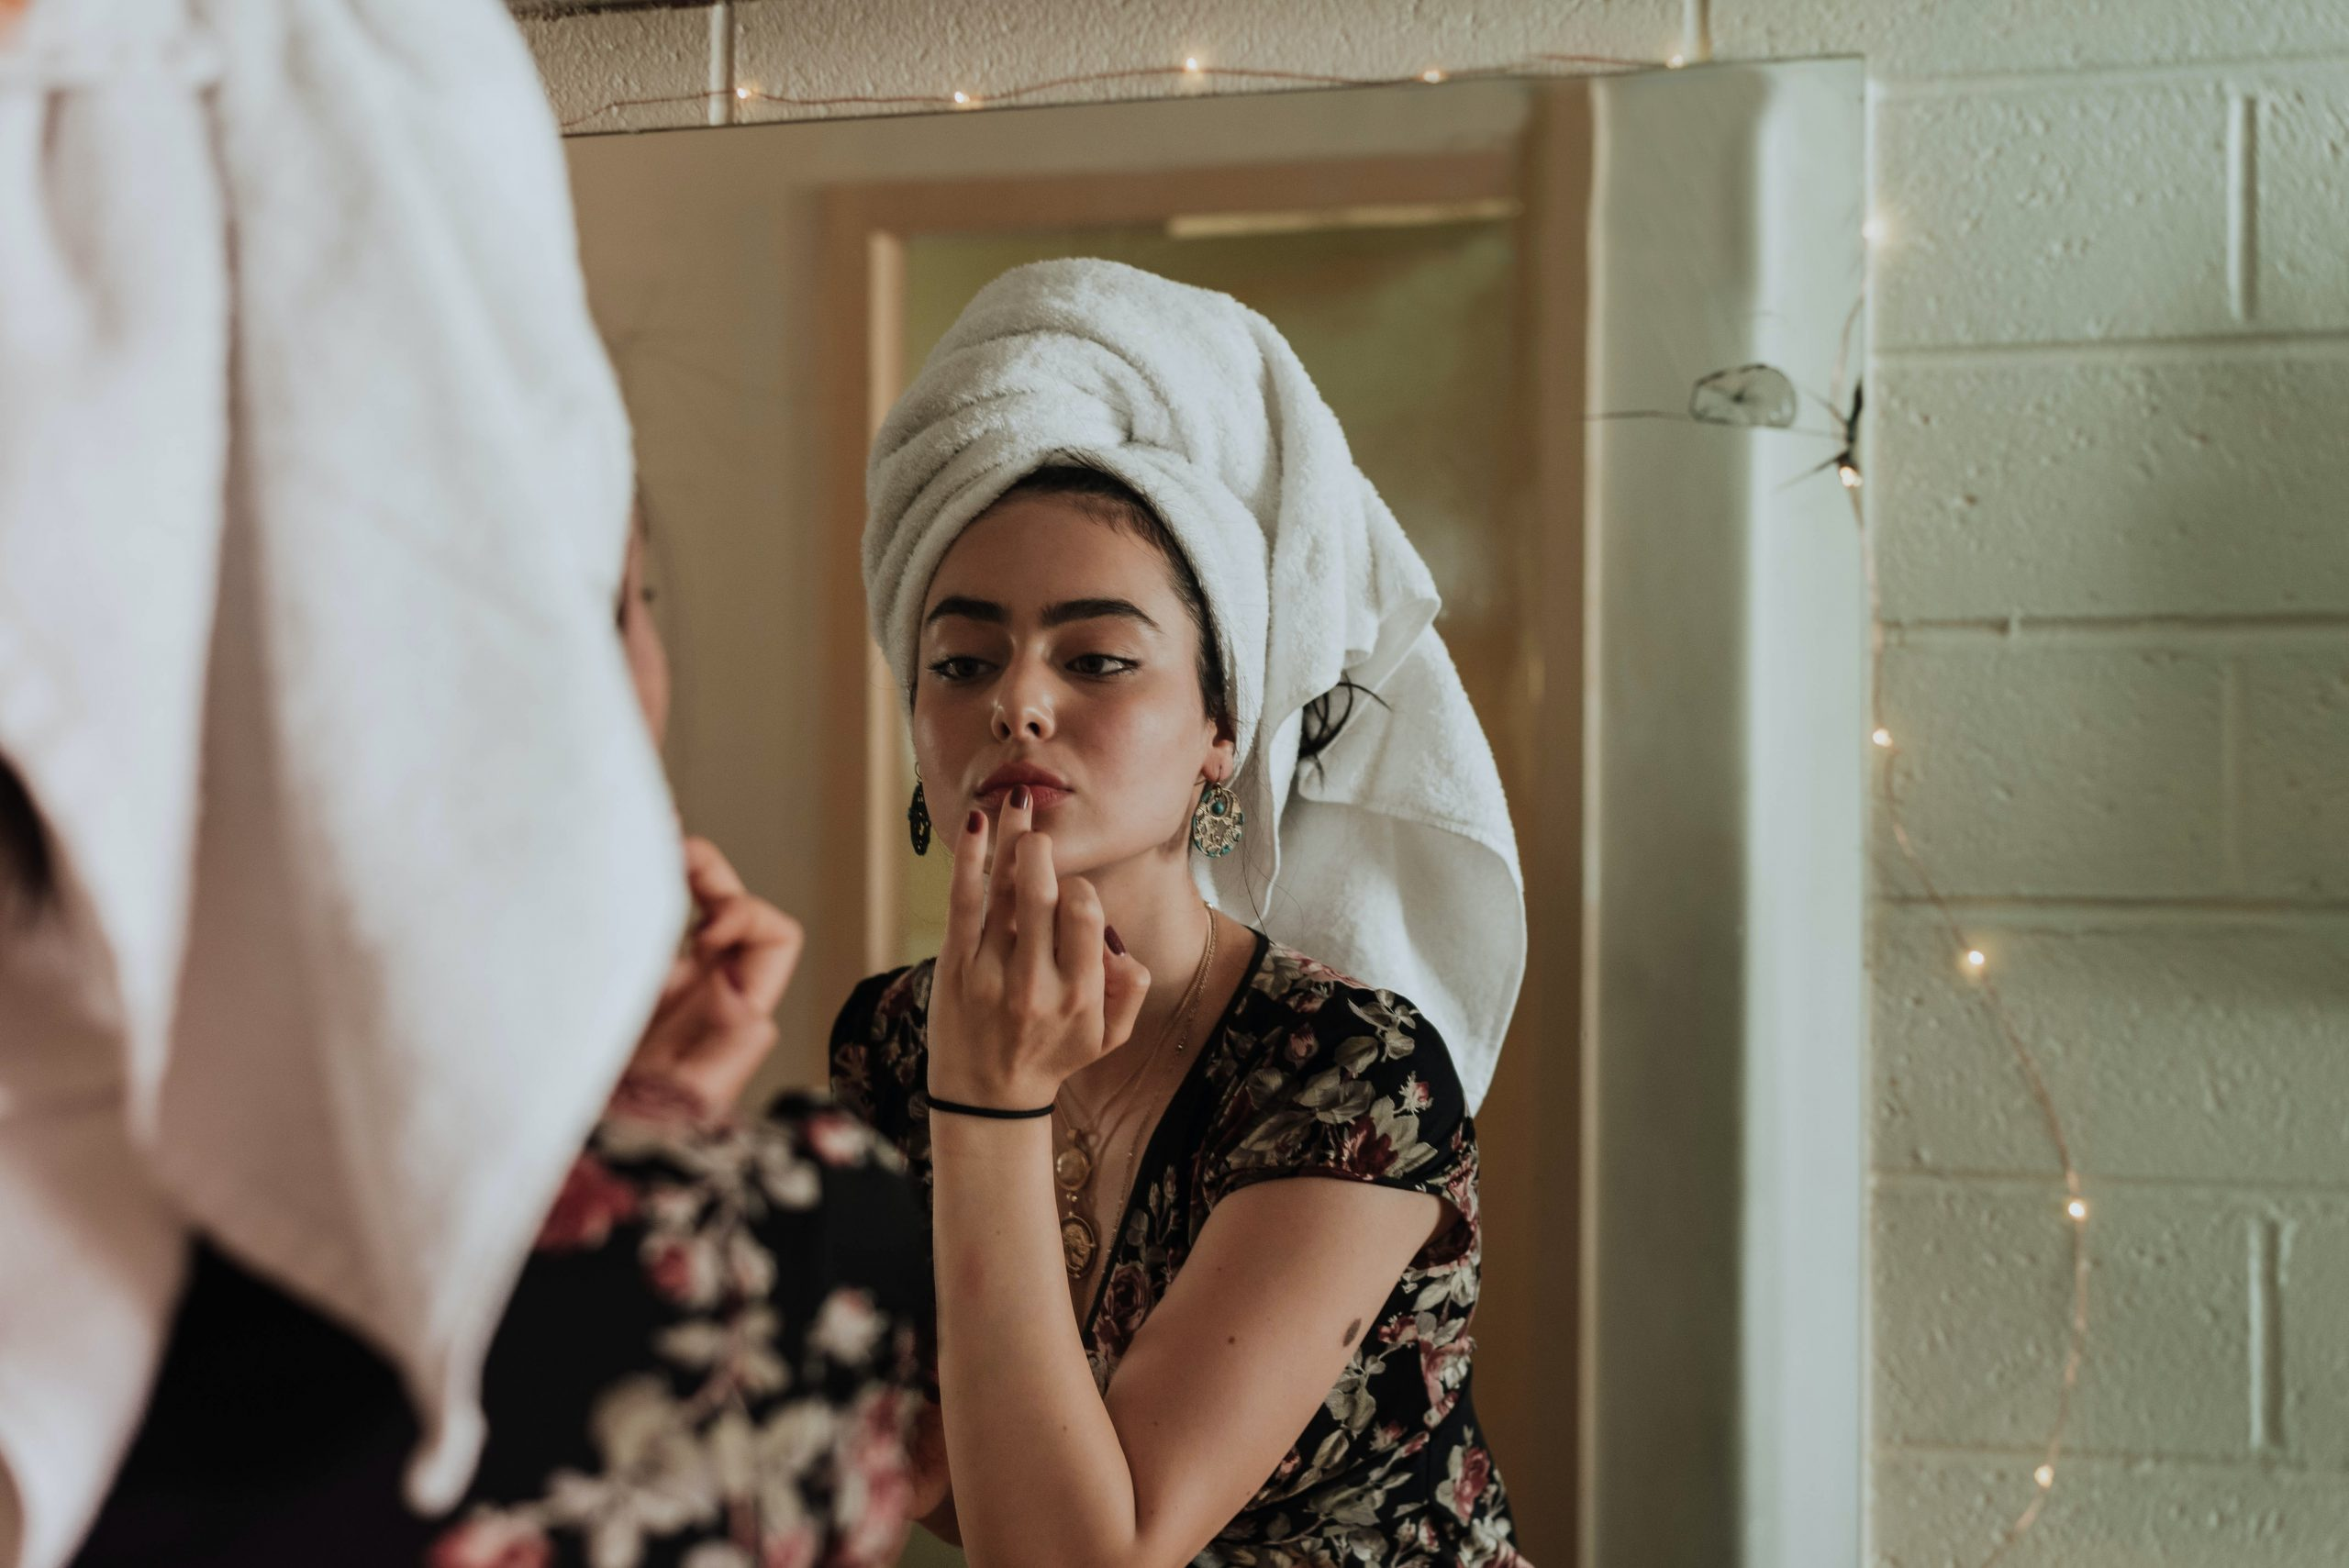 Mujer joven frente al espejo aplicandose lapiz labial